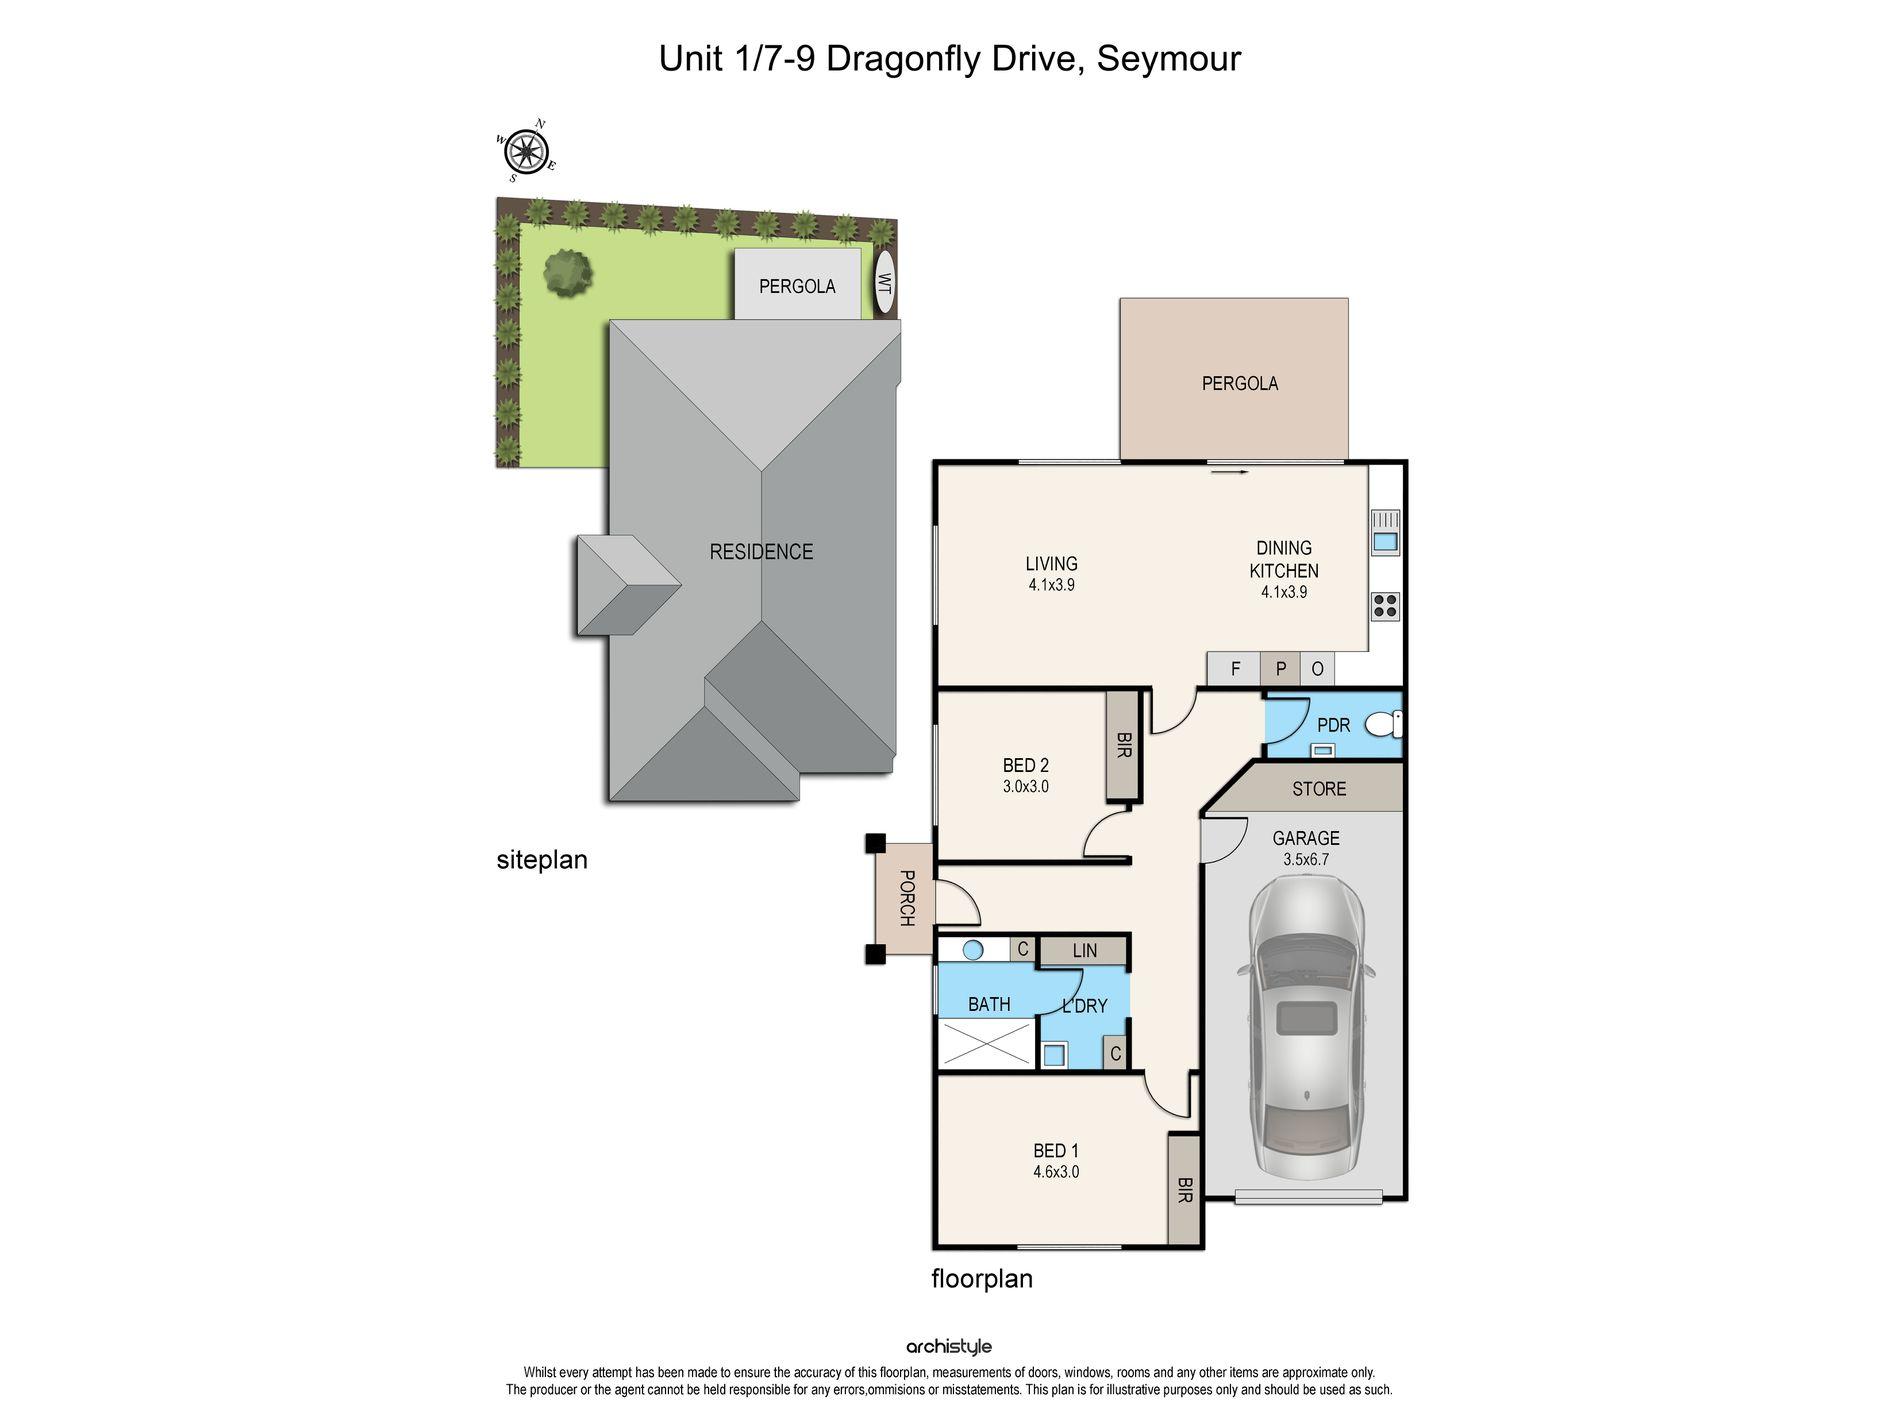 Unit 1 / 7 Dragonfly Drive, Seymour